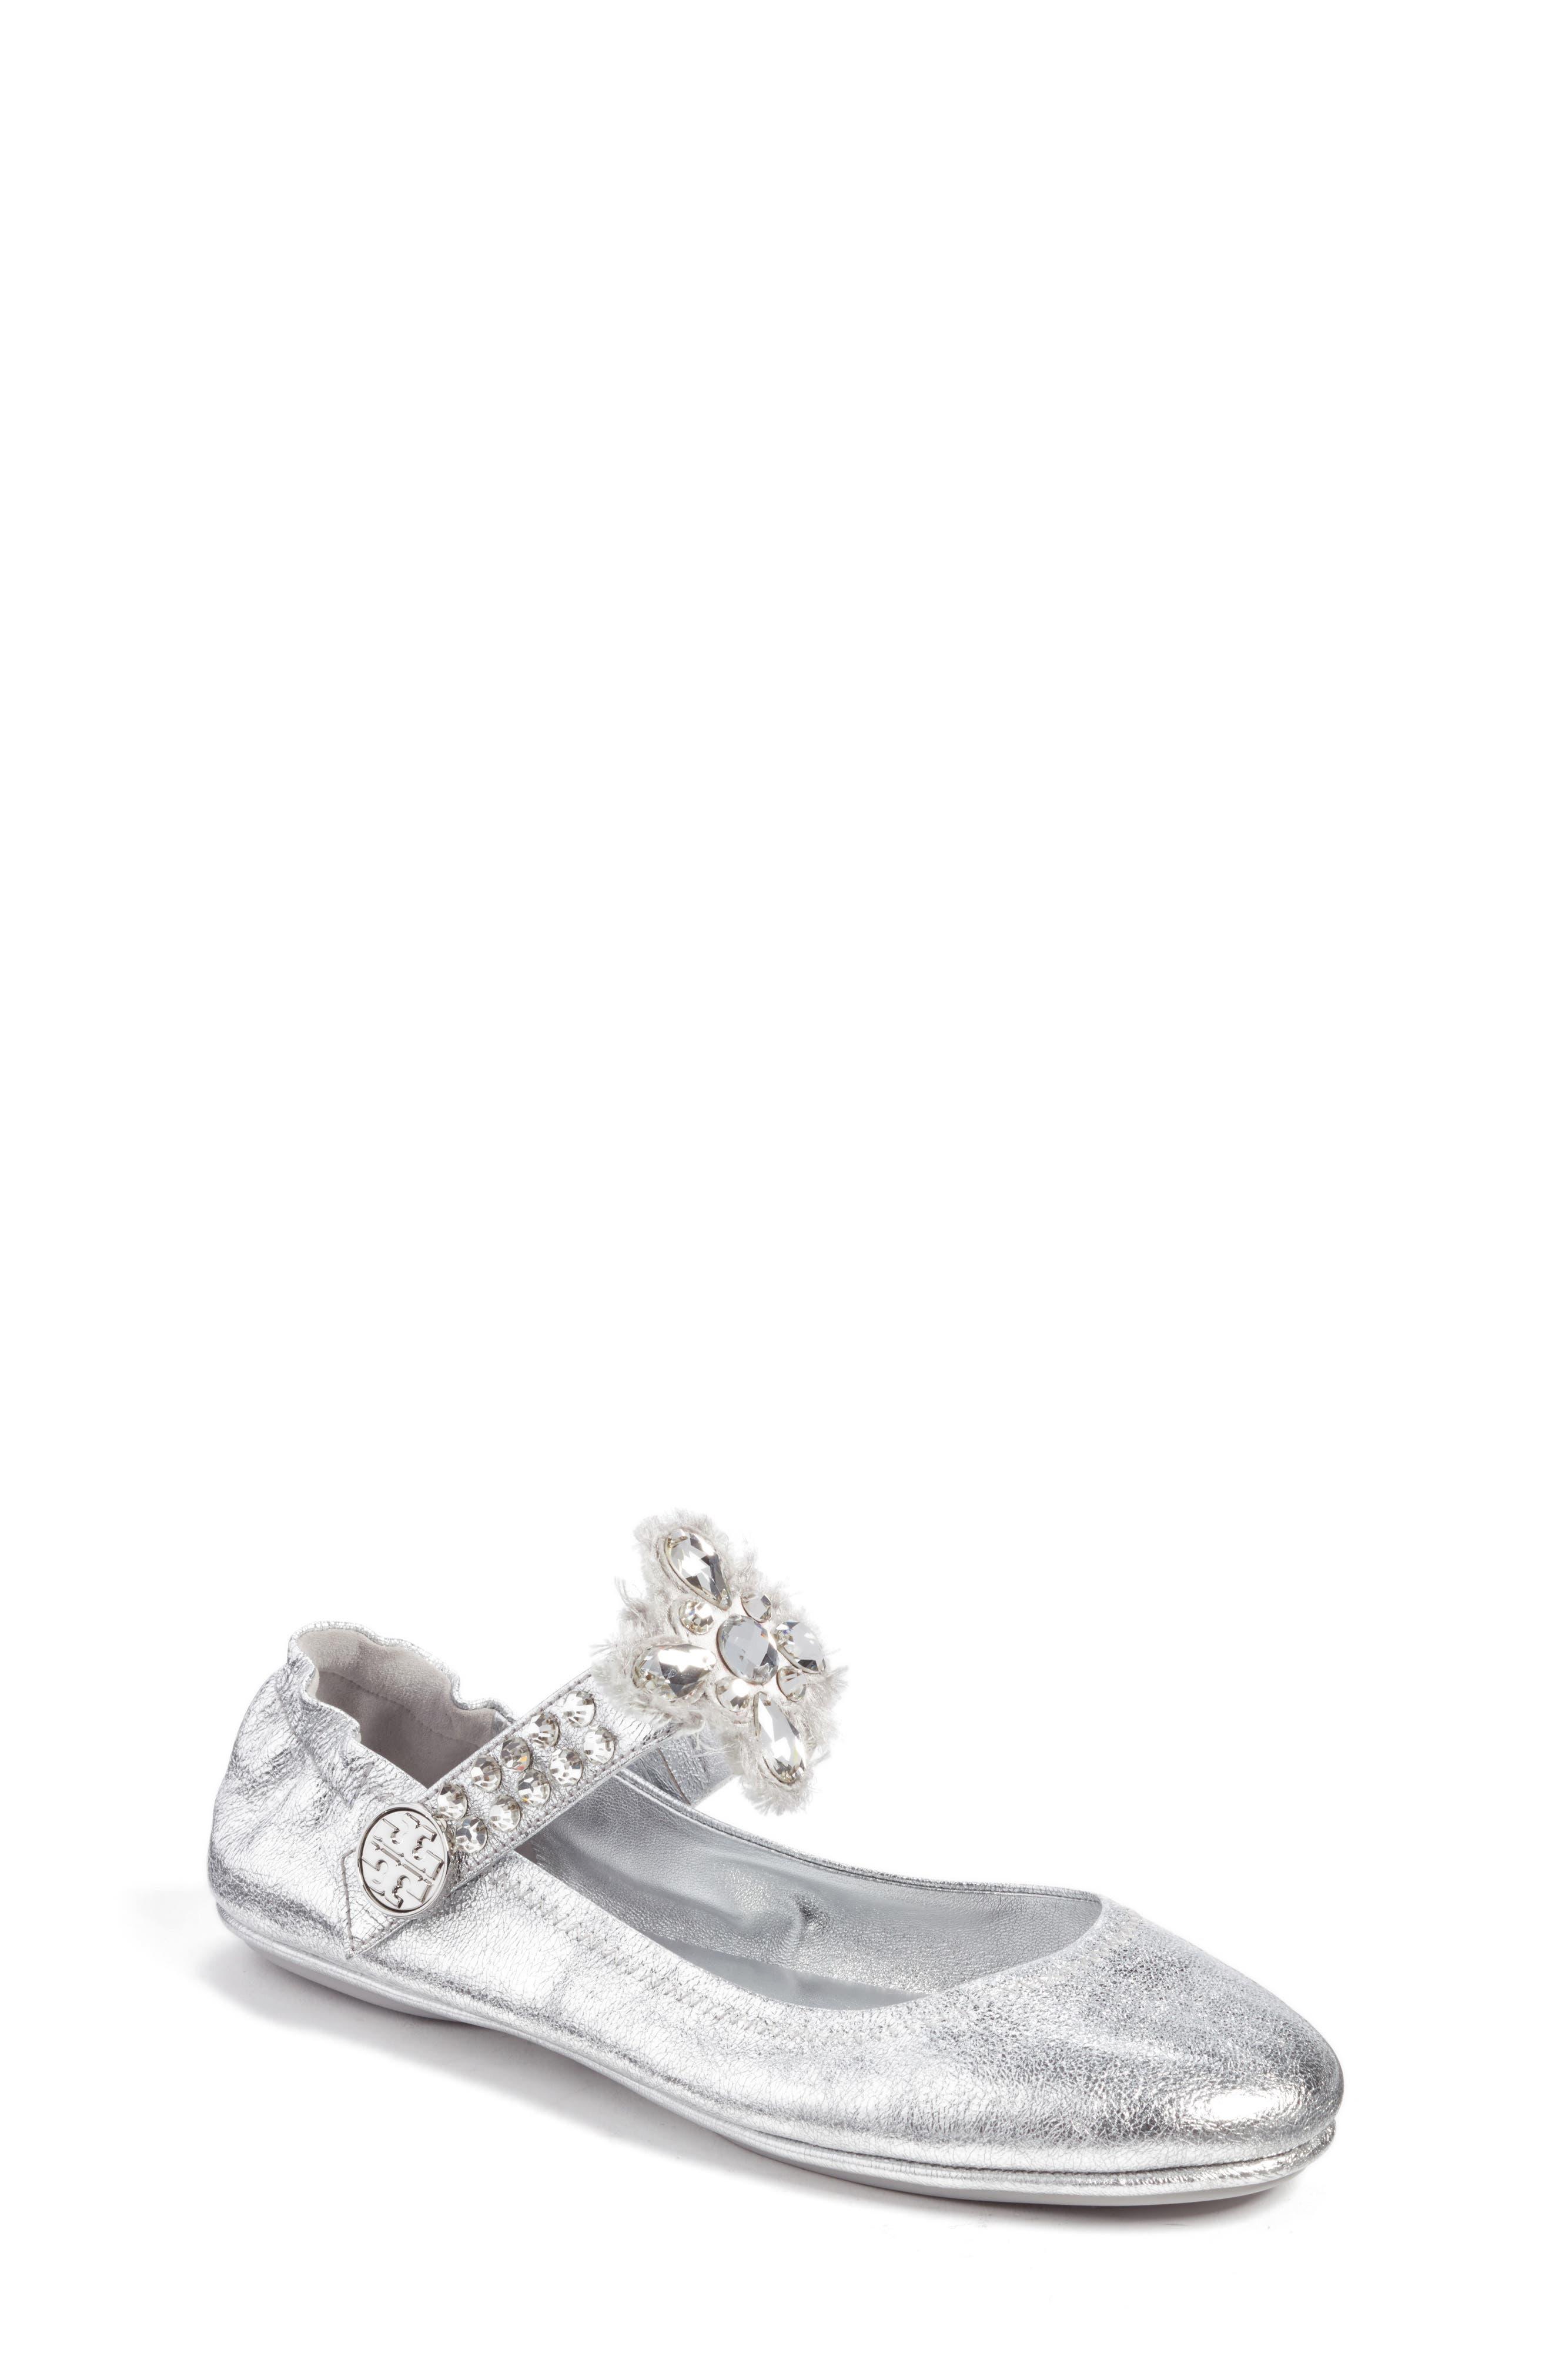 Tory Burch Minnie Embellished Convertible Strap Ballet Flat (Women)